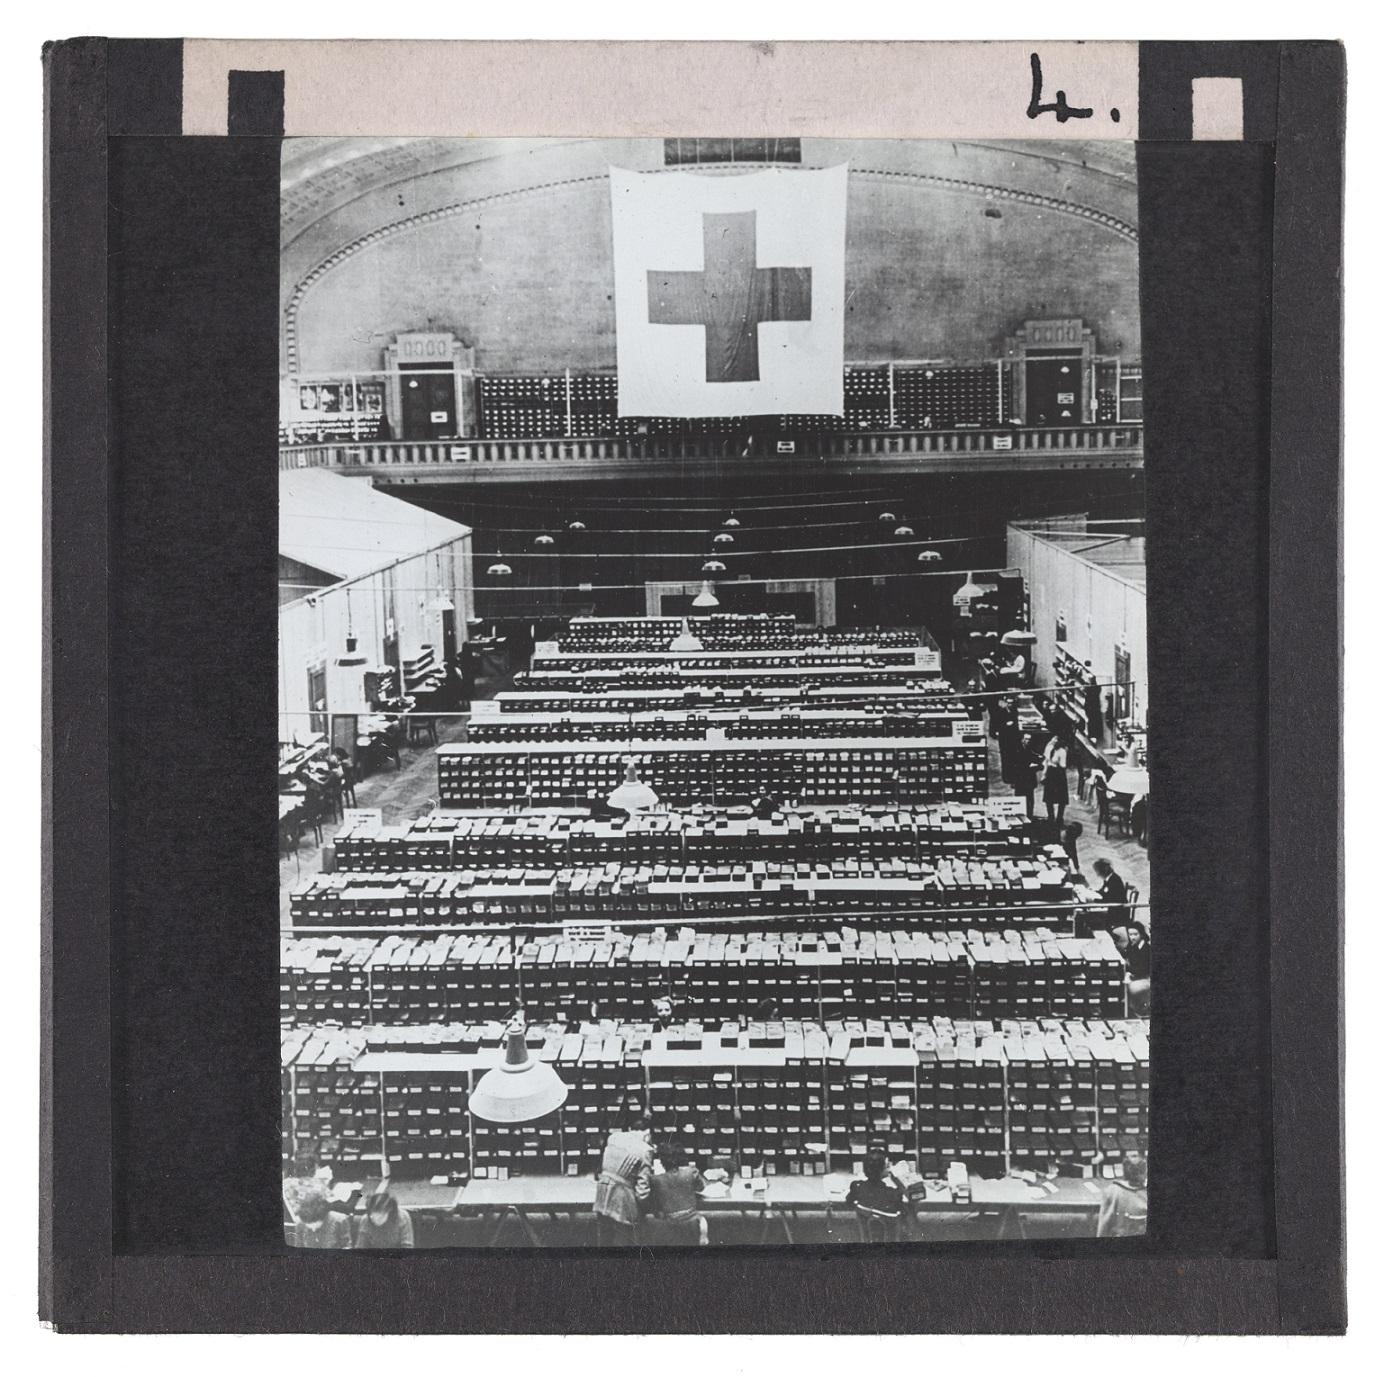 Central Prisoners of War Agency, Geneva, Switzerland